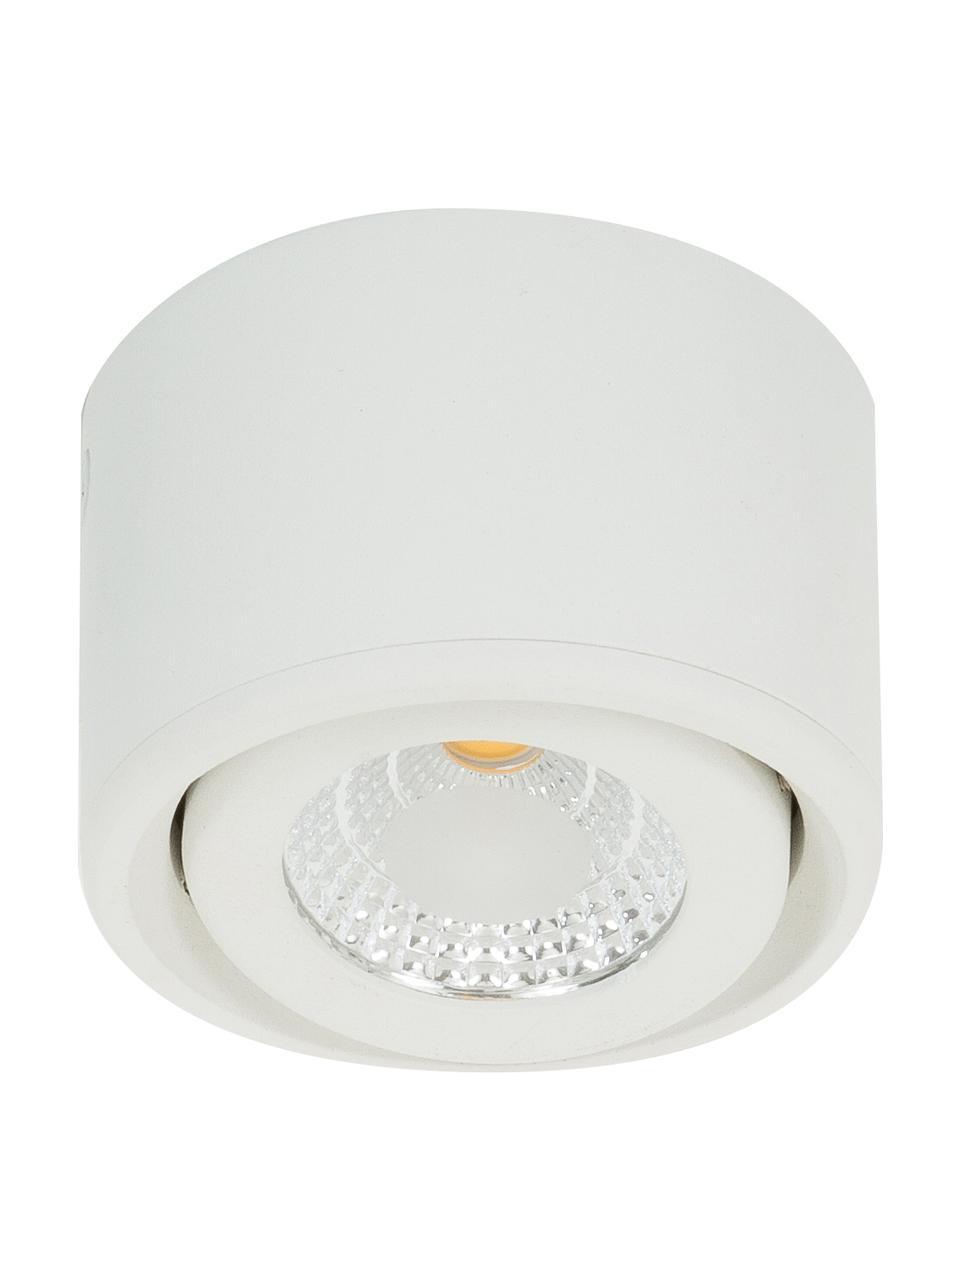 Spot plafond LED blanc Anzio, Blanc